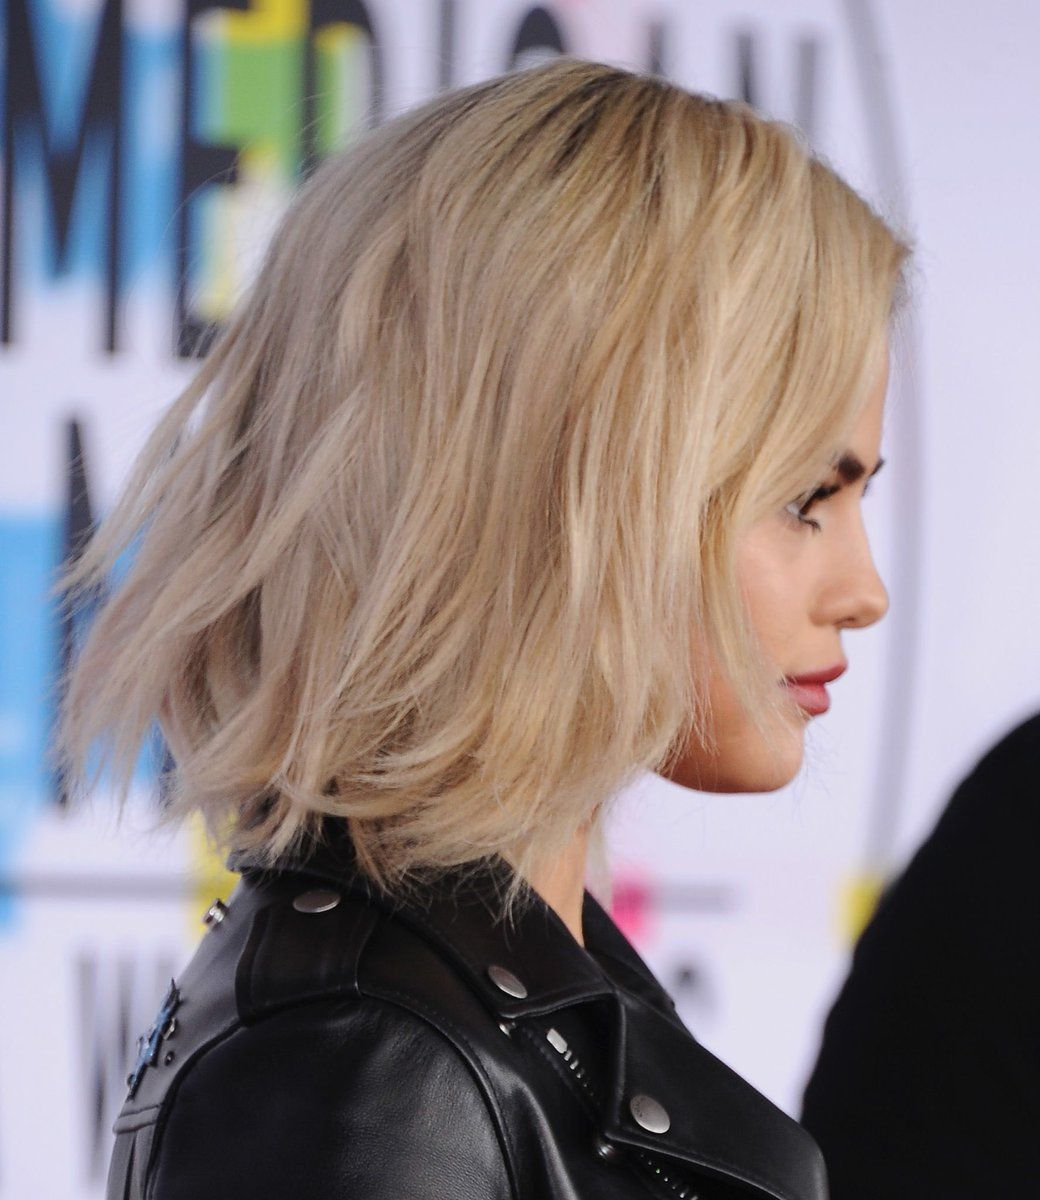 November 19 Selena Gomez Goes Blonde At The Ama 2017 Selenagomez Selena Gomez Hair Hairstyle Hair